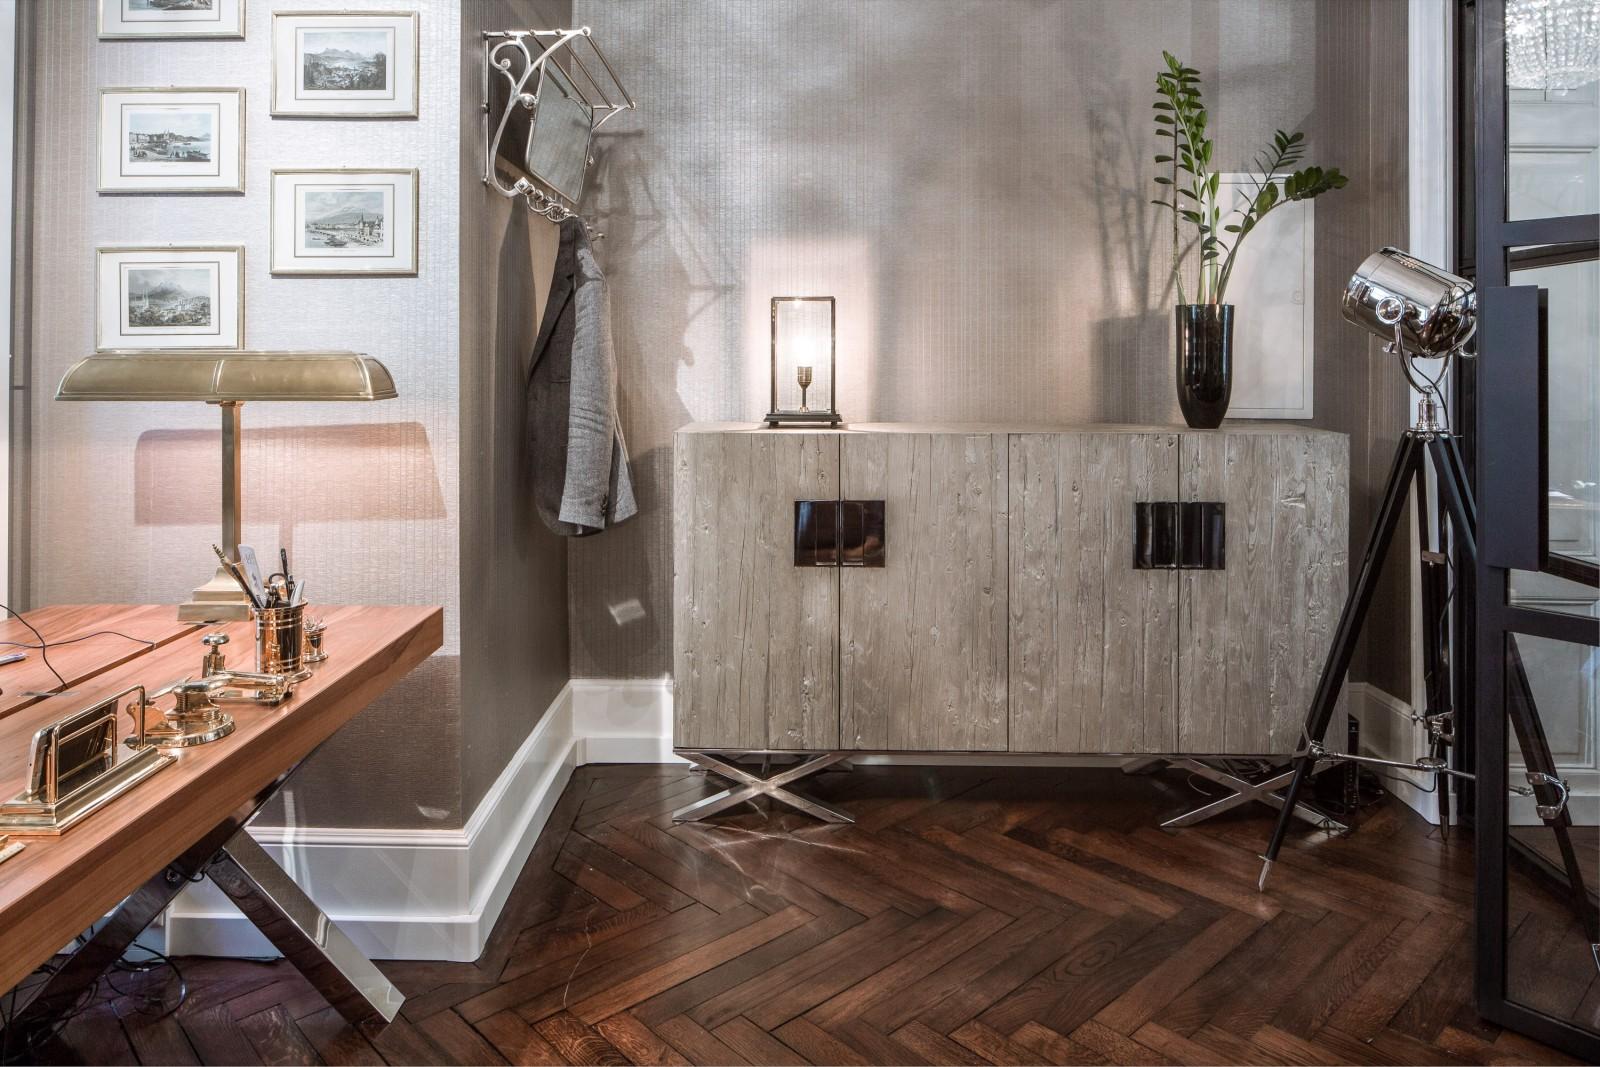 consus immobilien dyer smith frey interior branding zurich. Black Bedroom Furniture Sets. Home Design Ideas